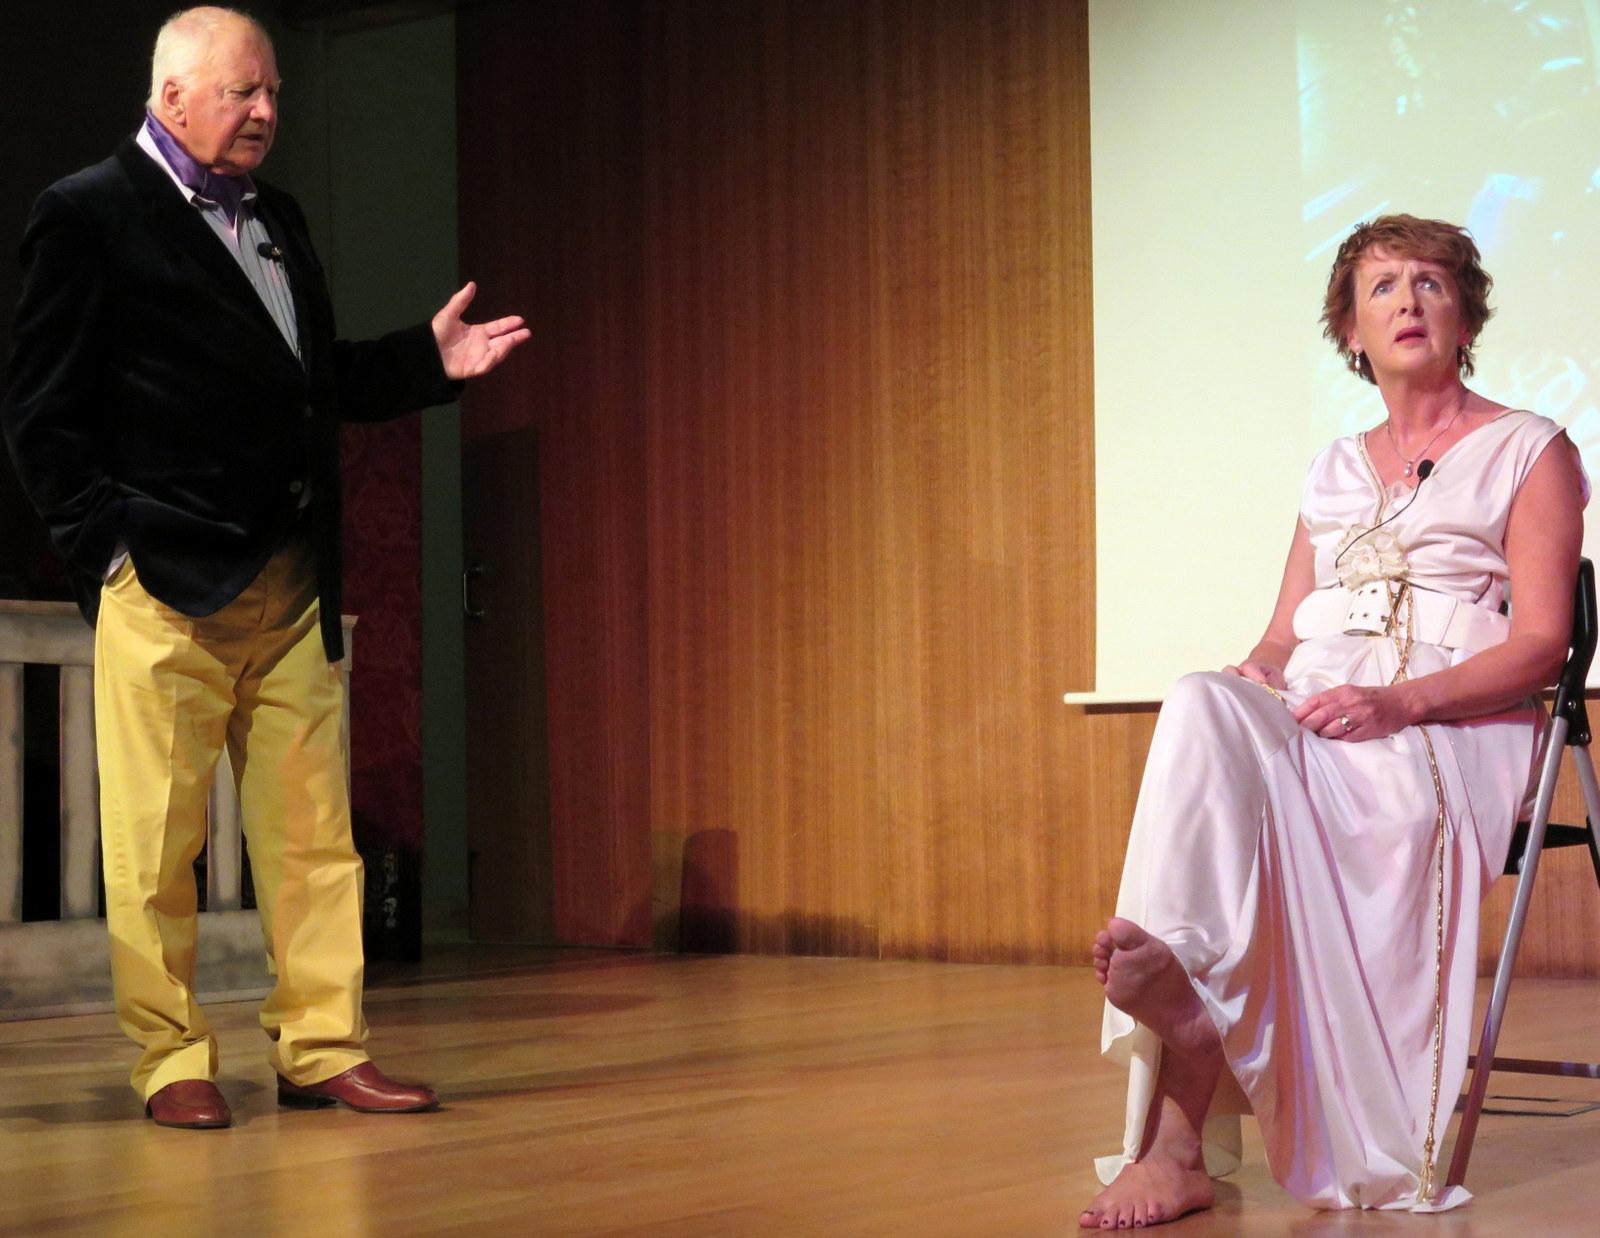 31-Mick and Linda as ghost